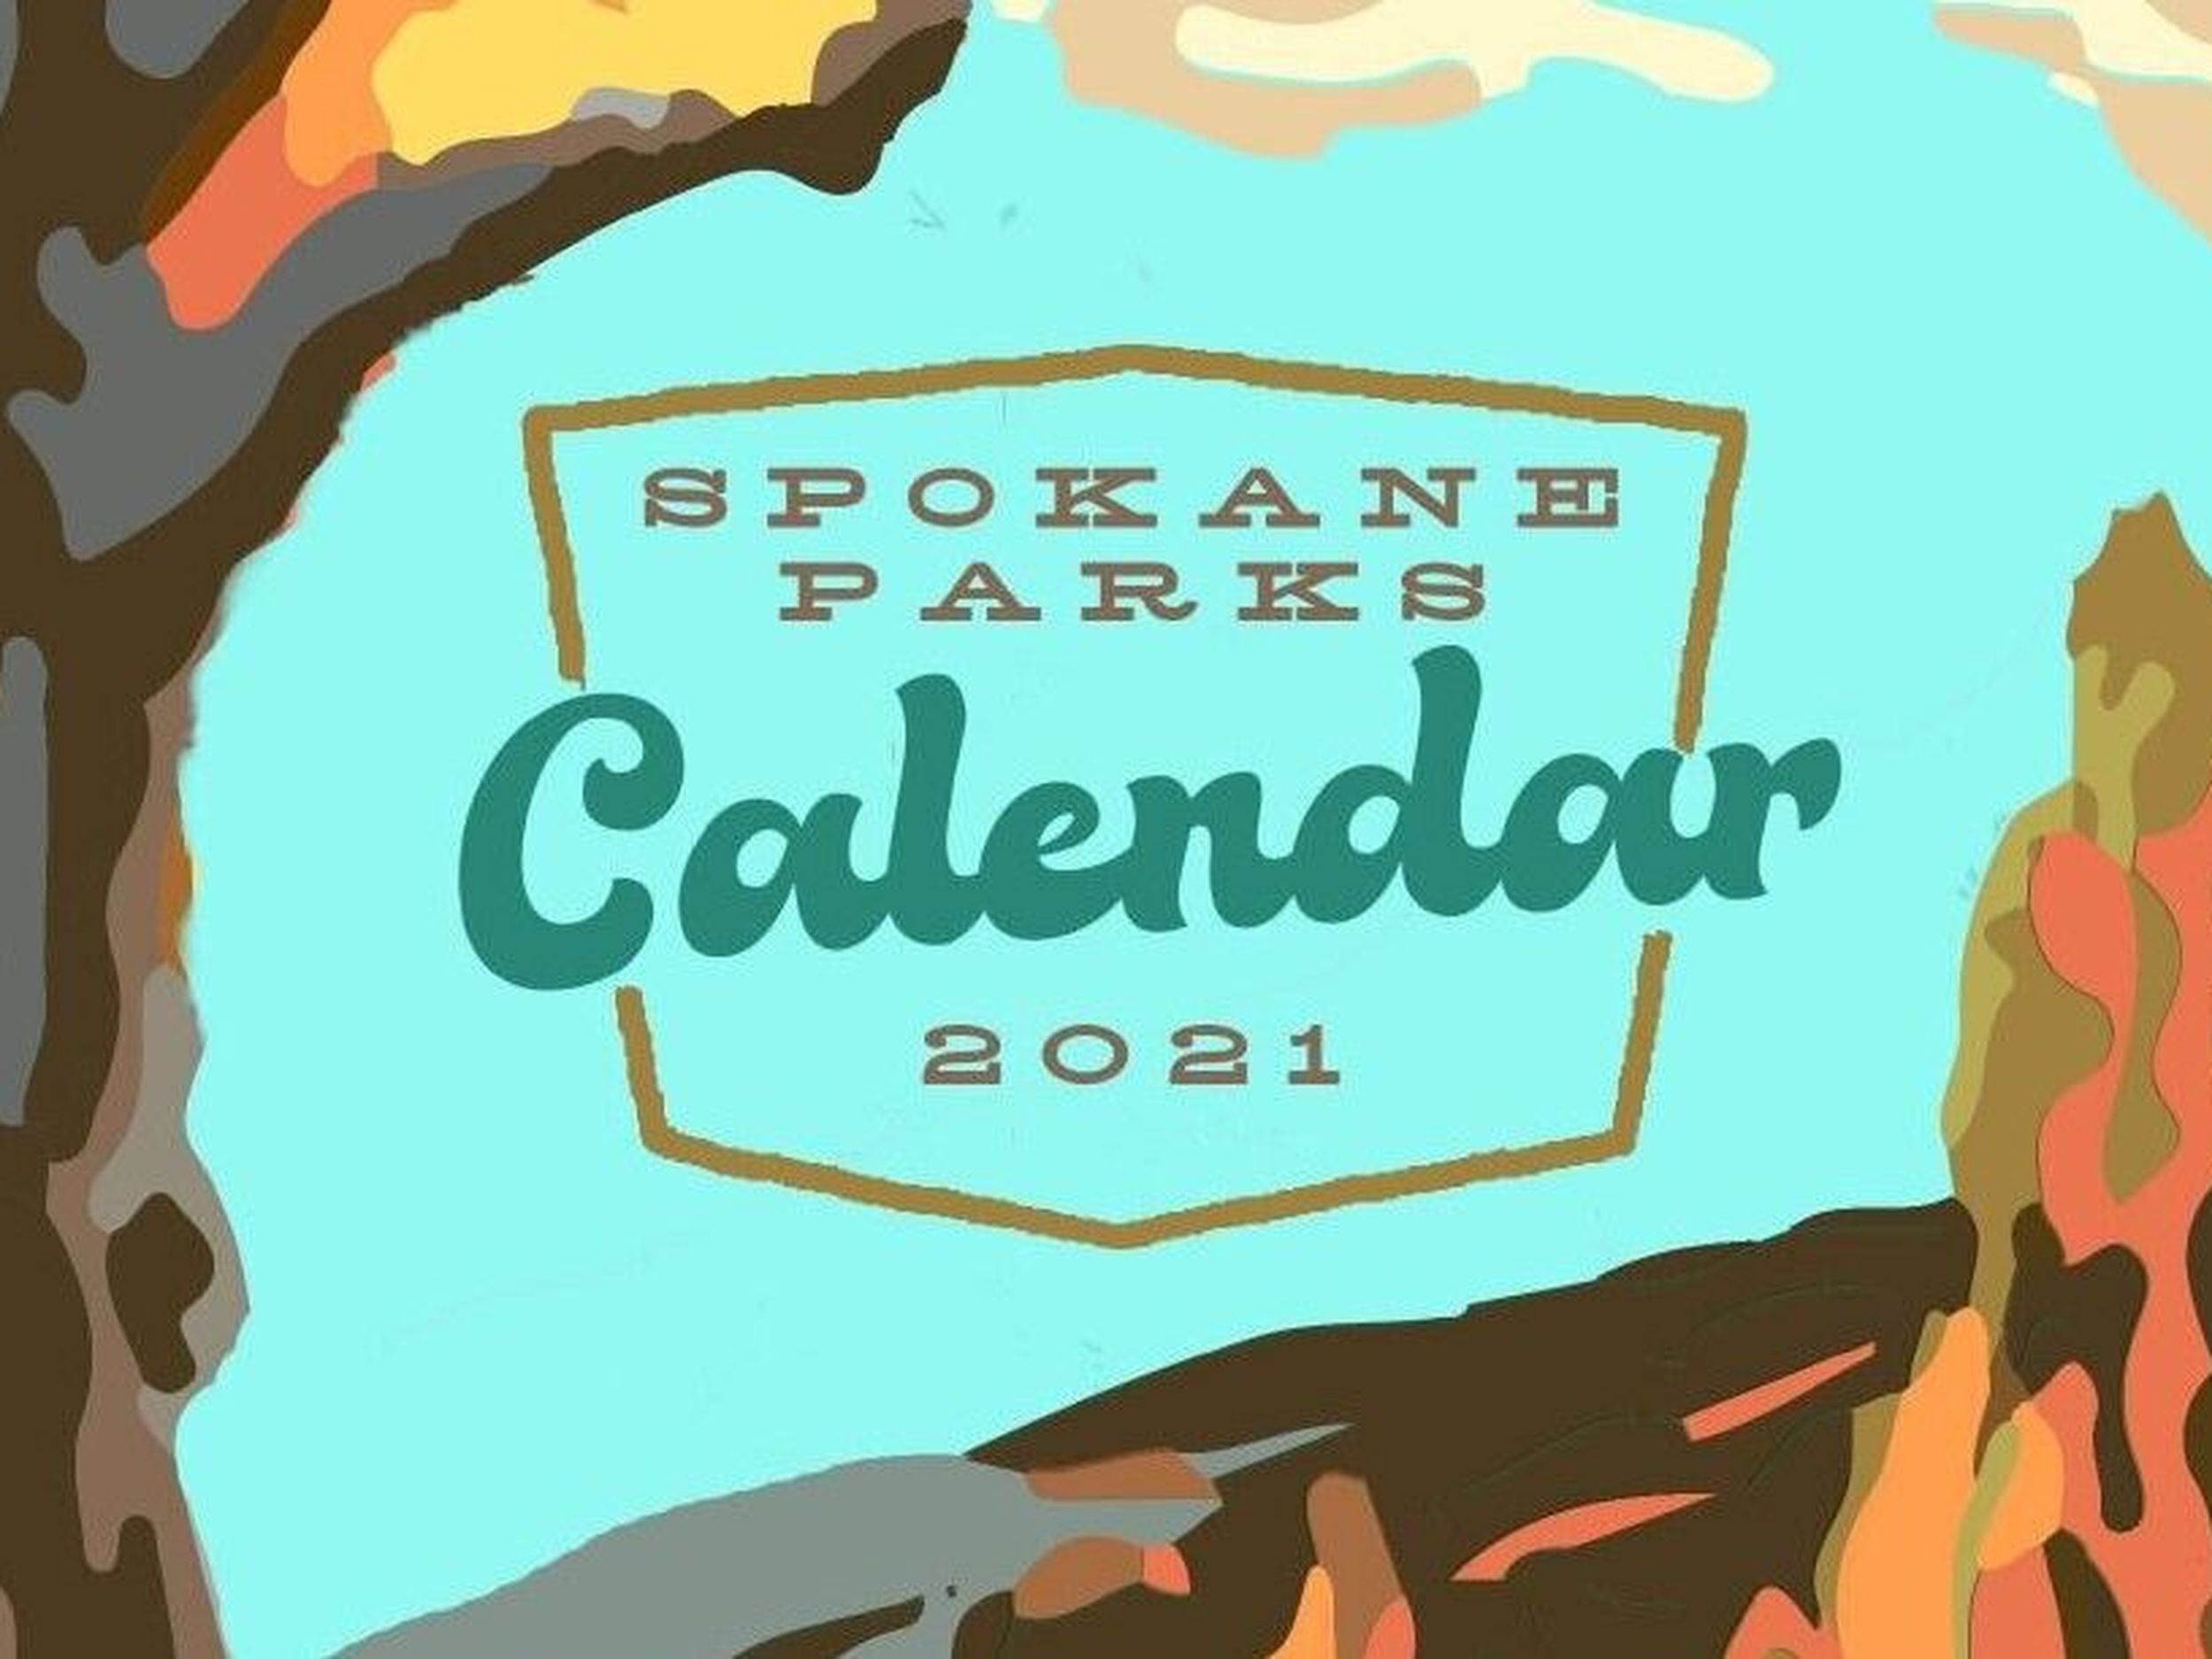 Artist Chris Bovey Features Spokane Parks In 2021 Calendar The Spokesman Review